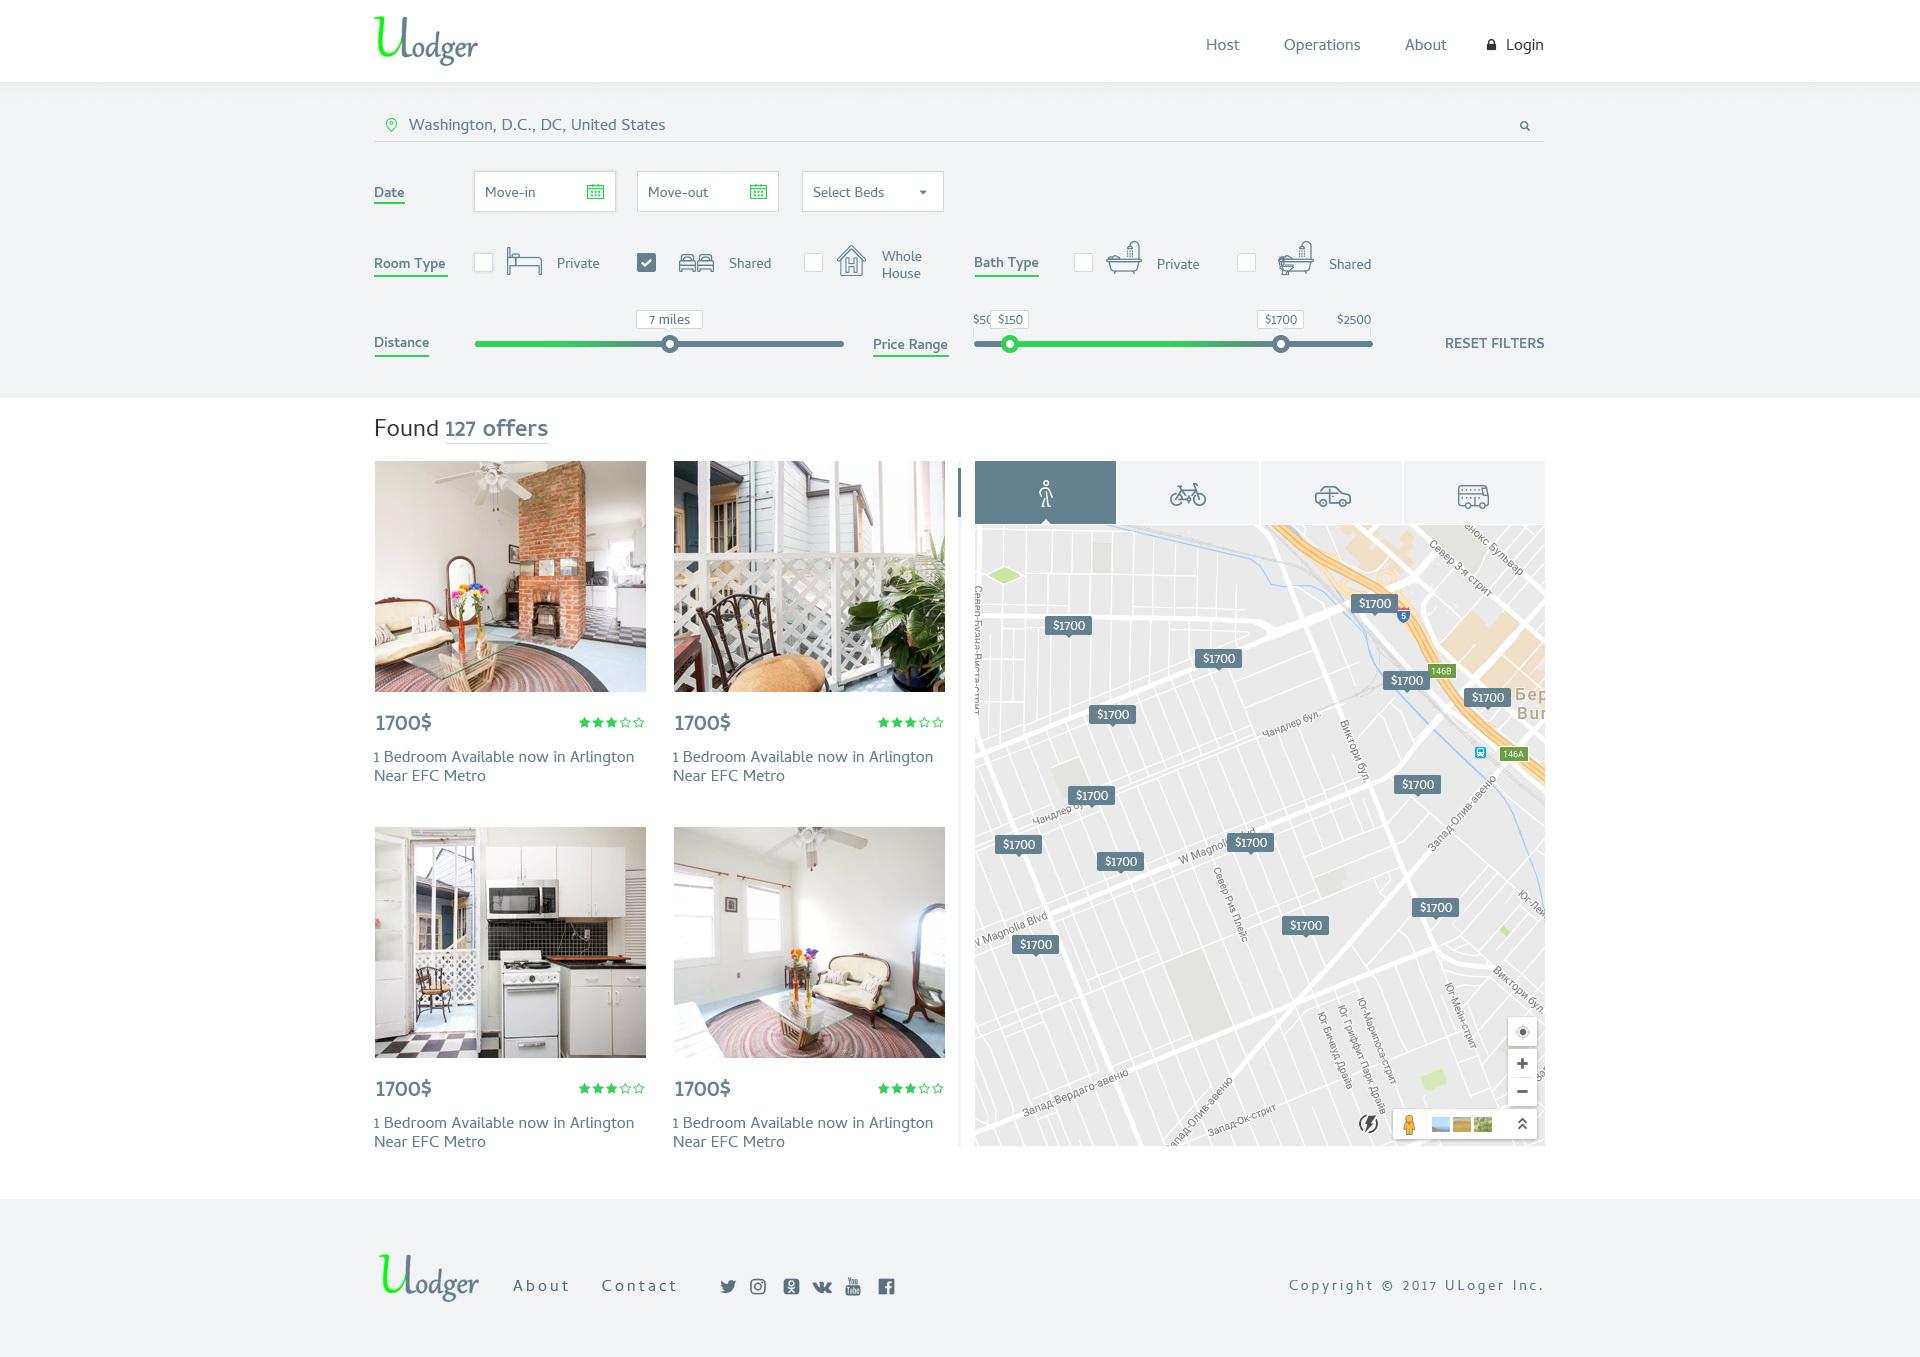 Ulodger - платформа для аренды жилья